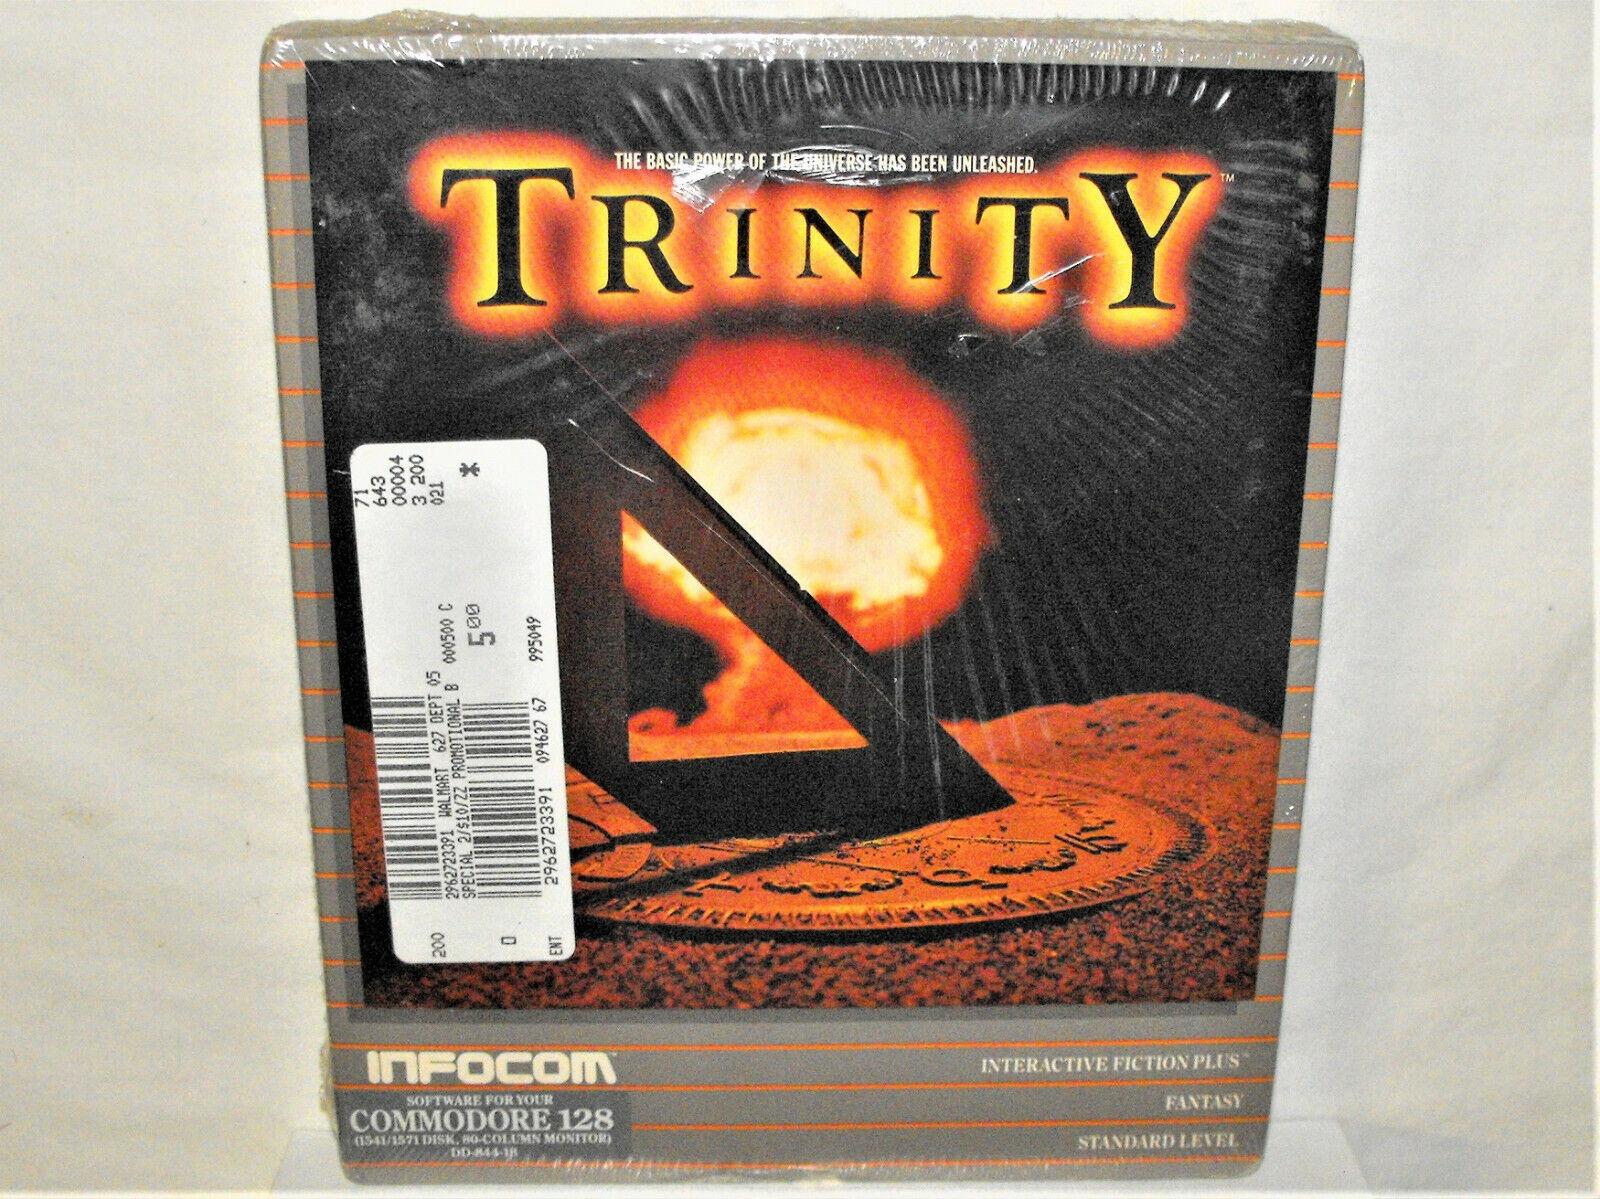 Computer Games - Commodore 64/128 PC Computer Game TRINITY Infocom Disk Fantasy Sci-Fi Sealed Box